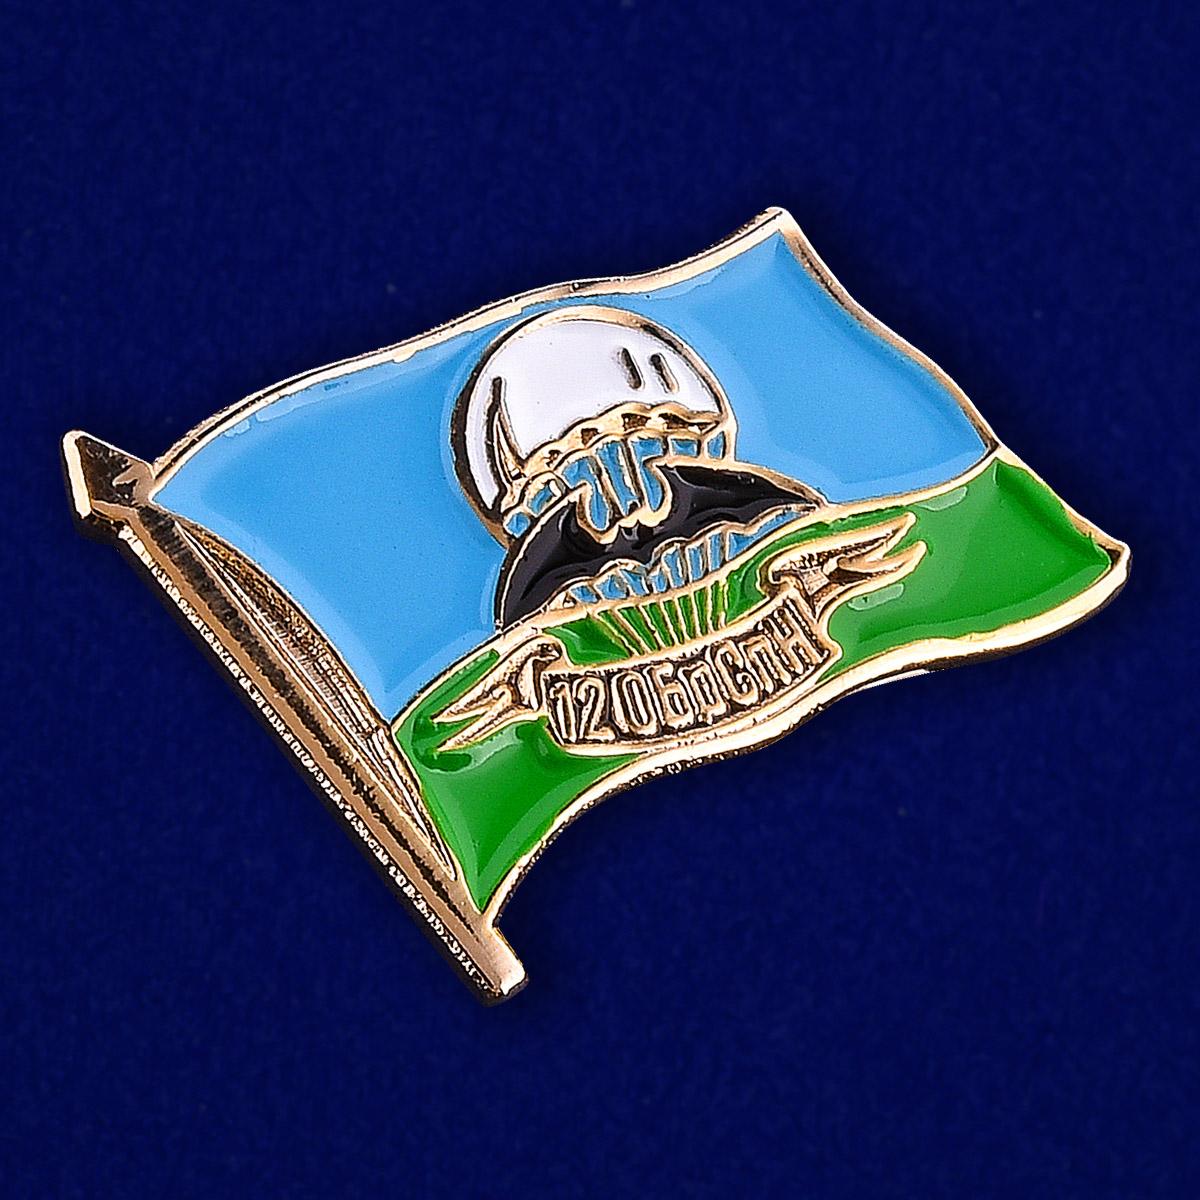 Значок для бойцов 12 бригады спецназа ГРУ